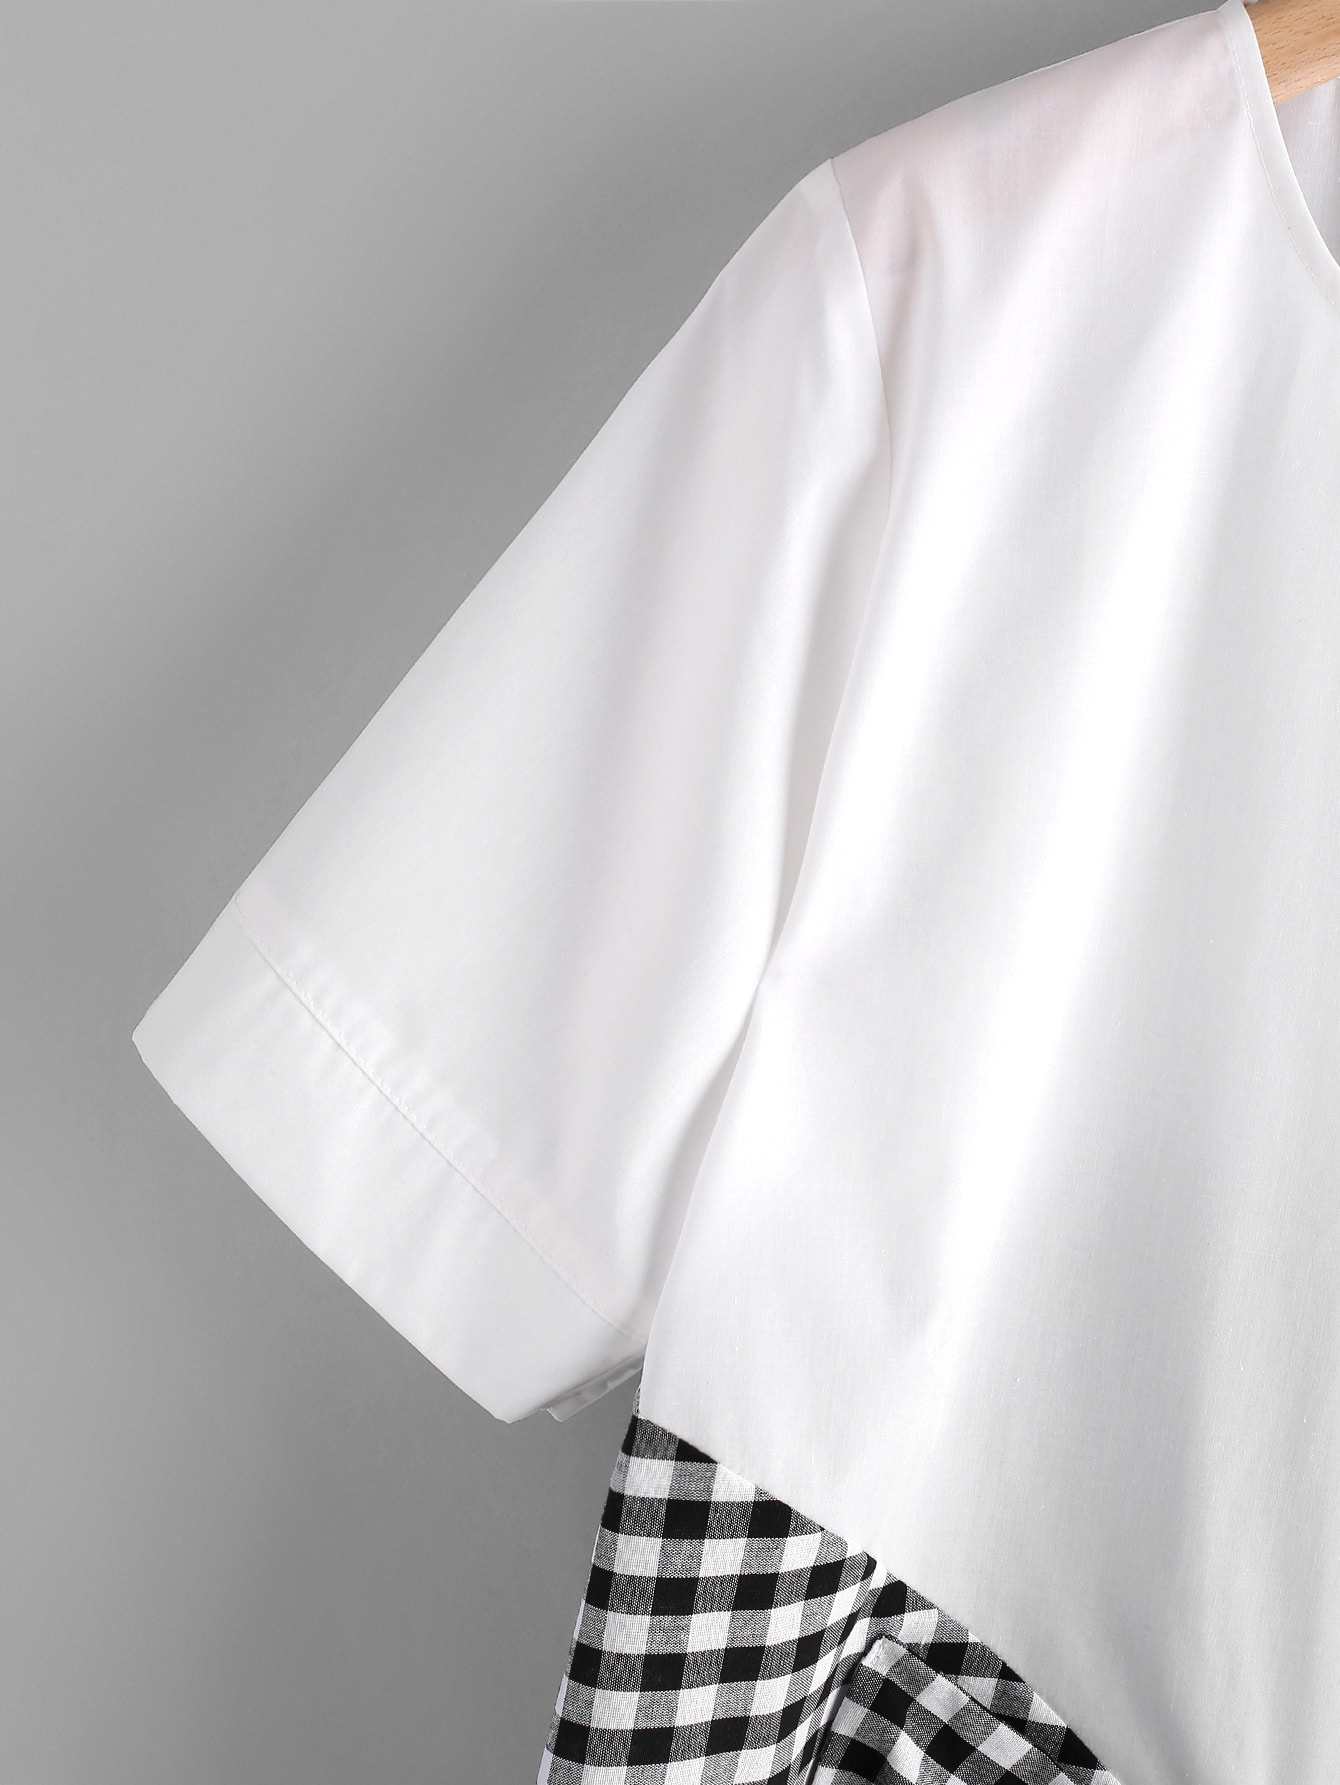 blouse170510005_2